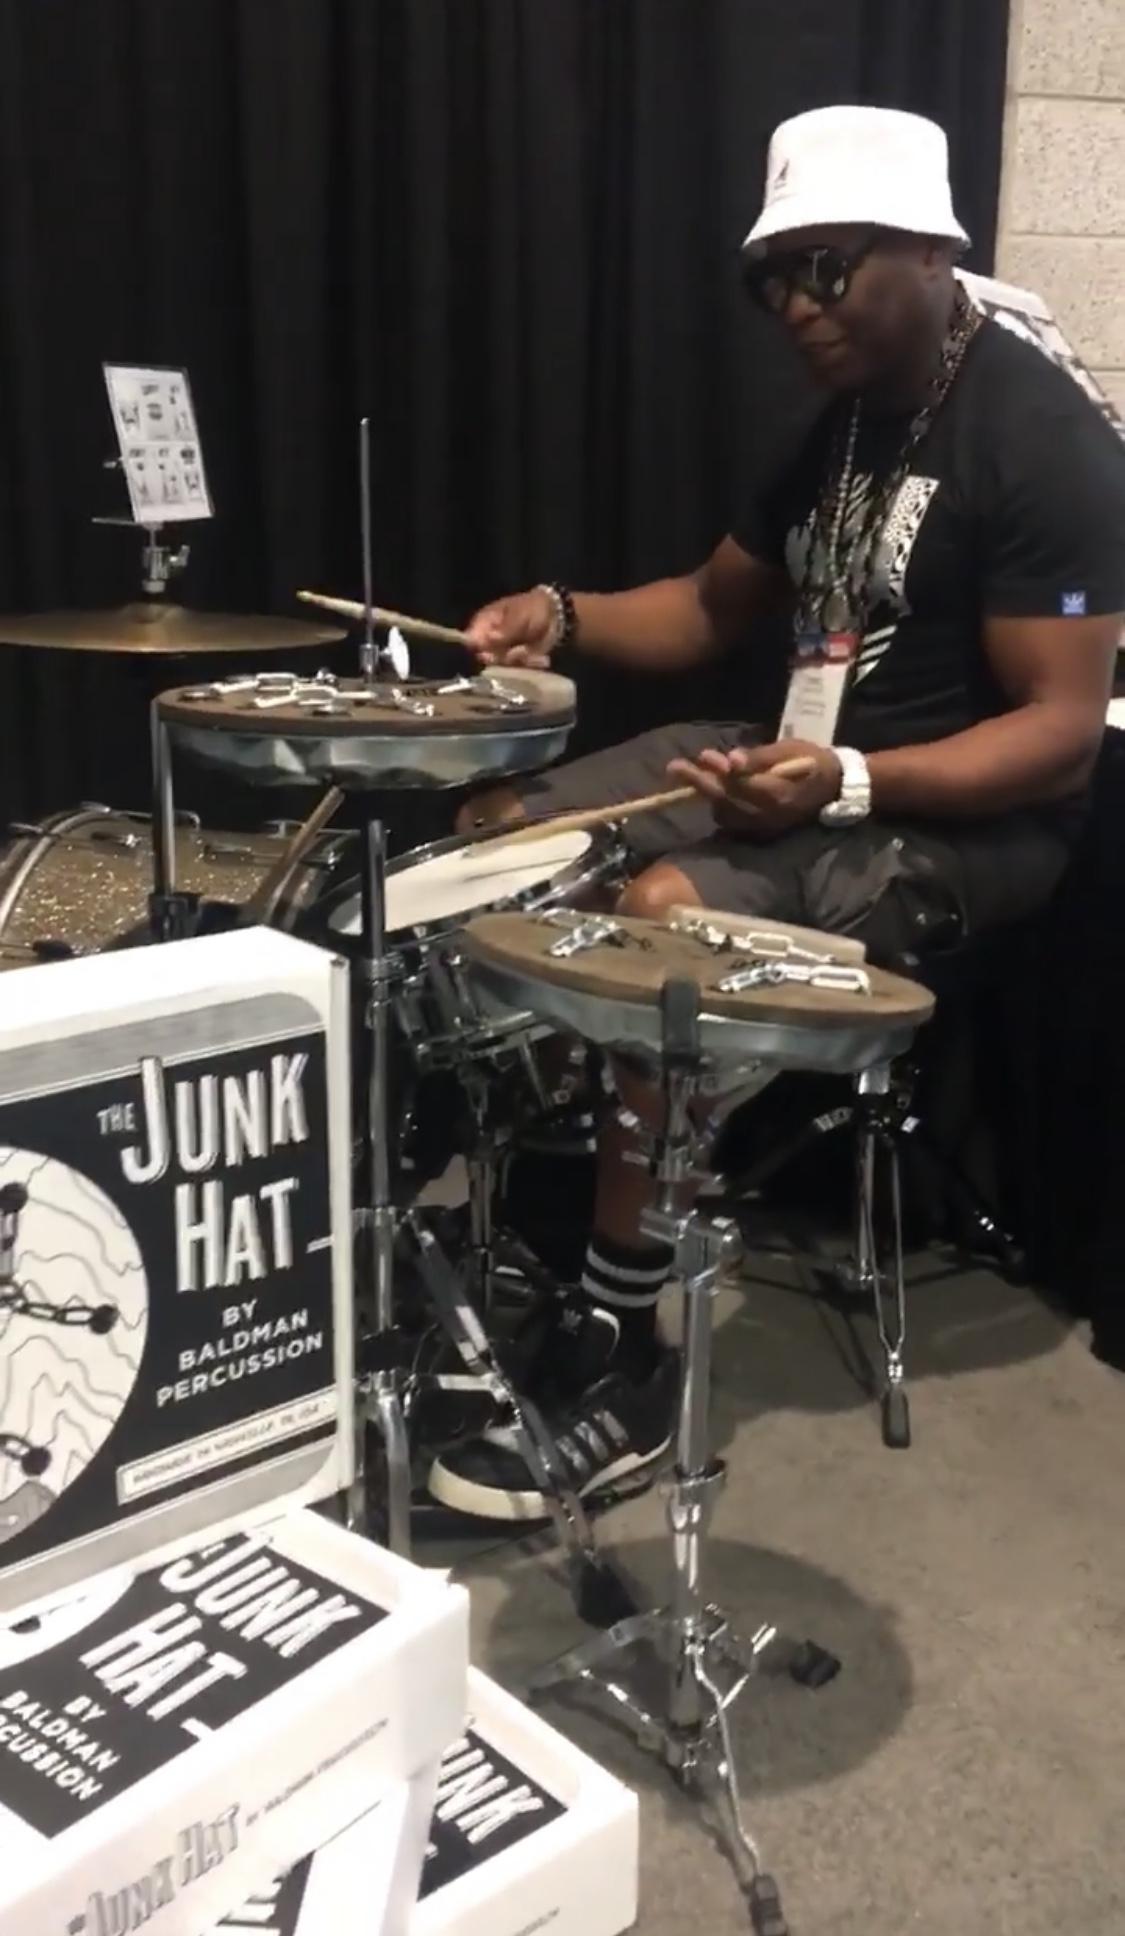 Baldman_Percussion_JunkHat-201907-02.jpg